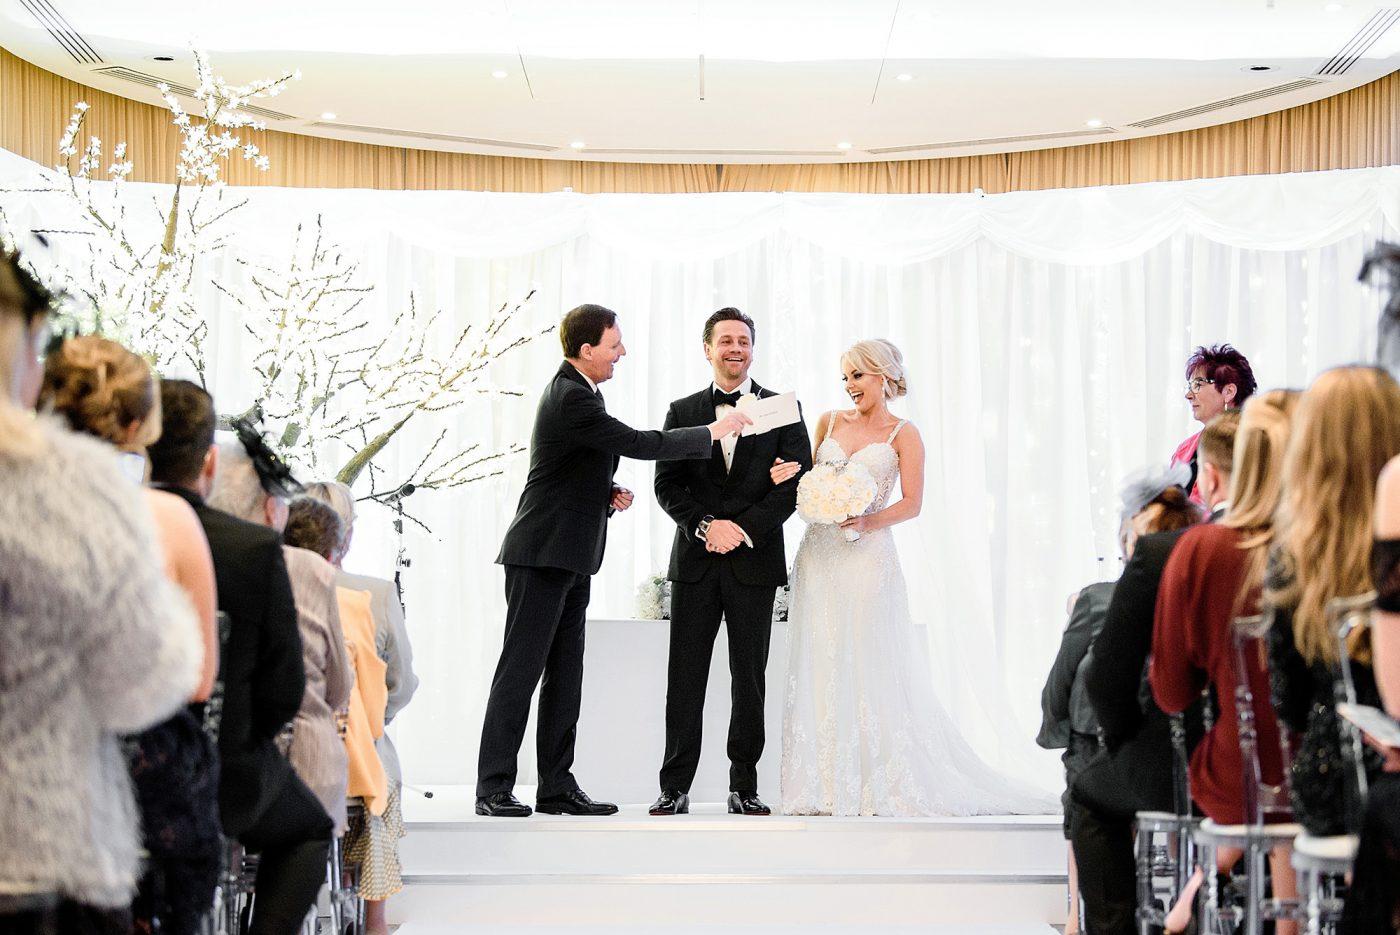 registrar hands bride the marriage certificate